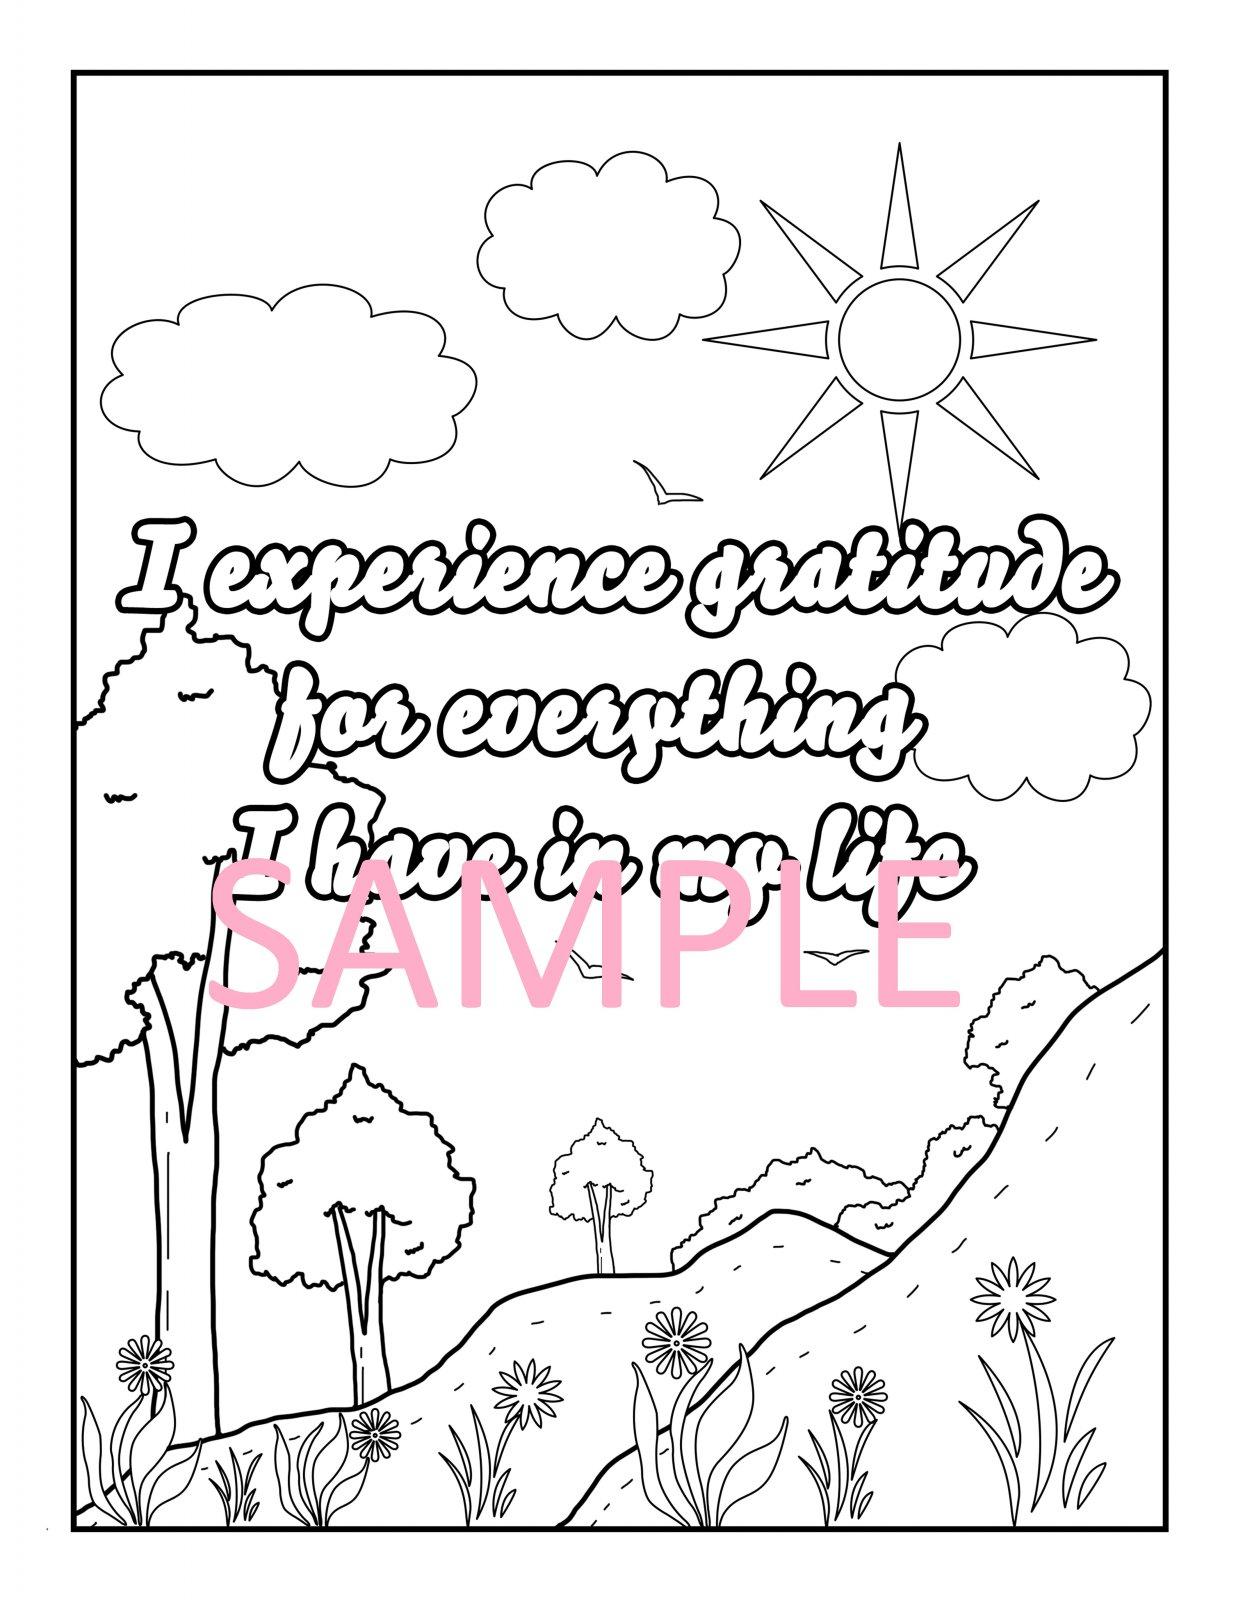 Gratitude Coloring Page 5